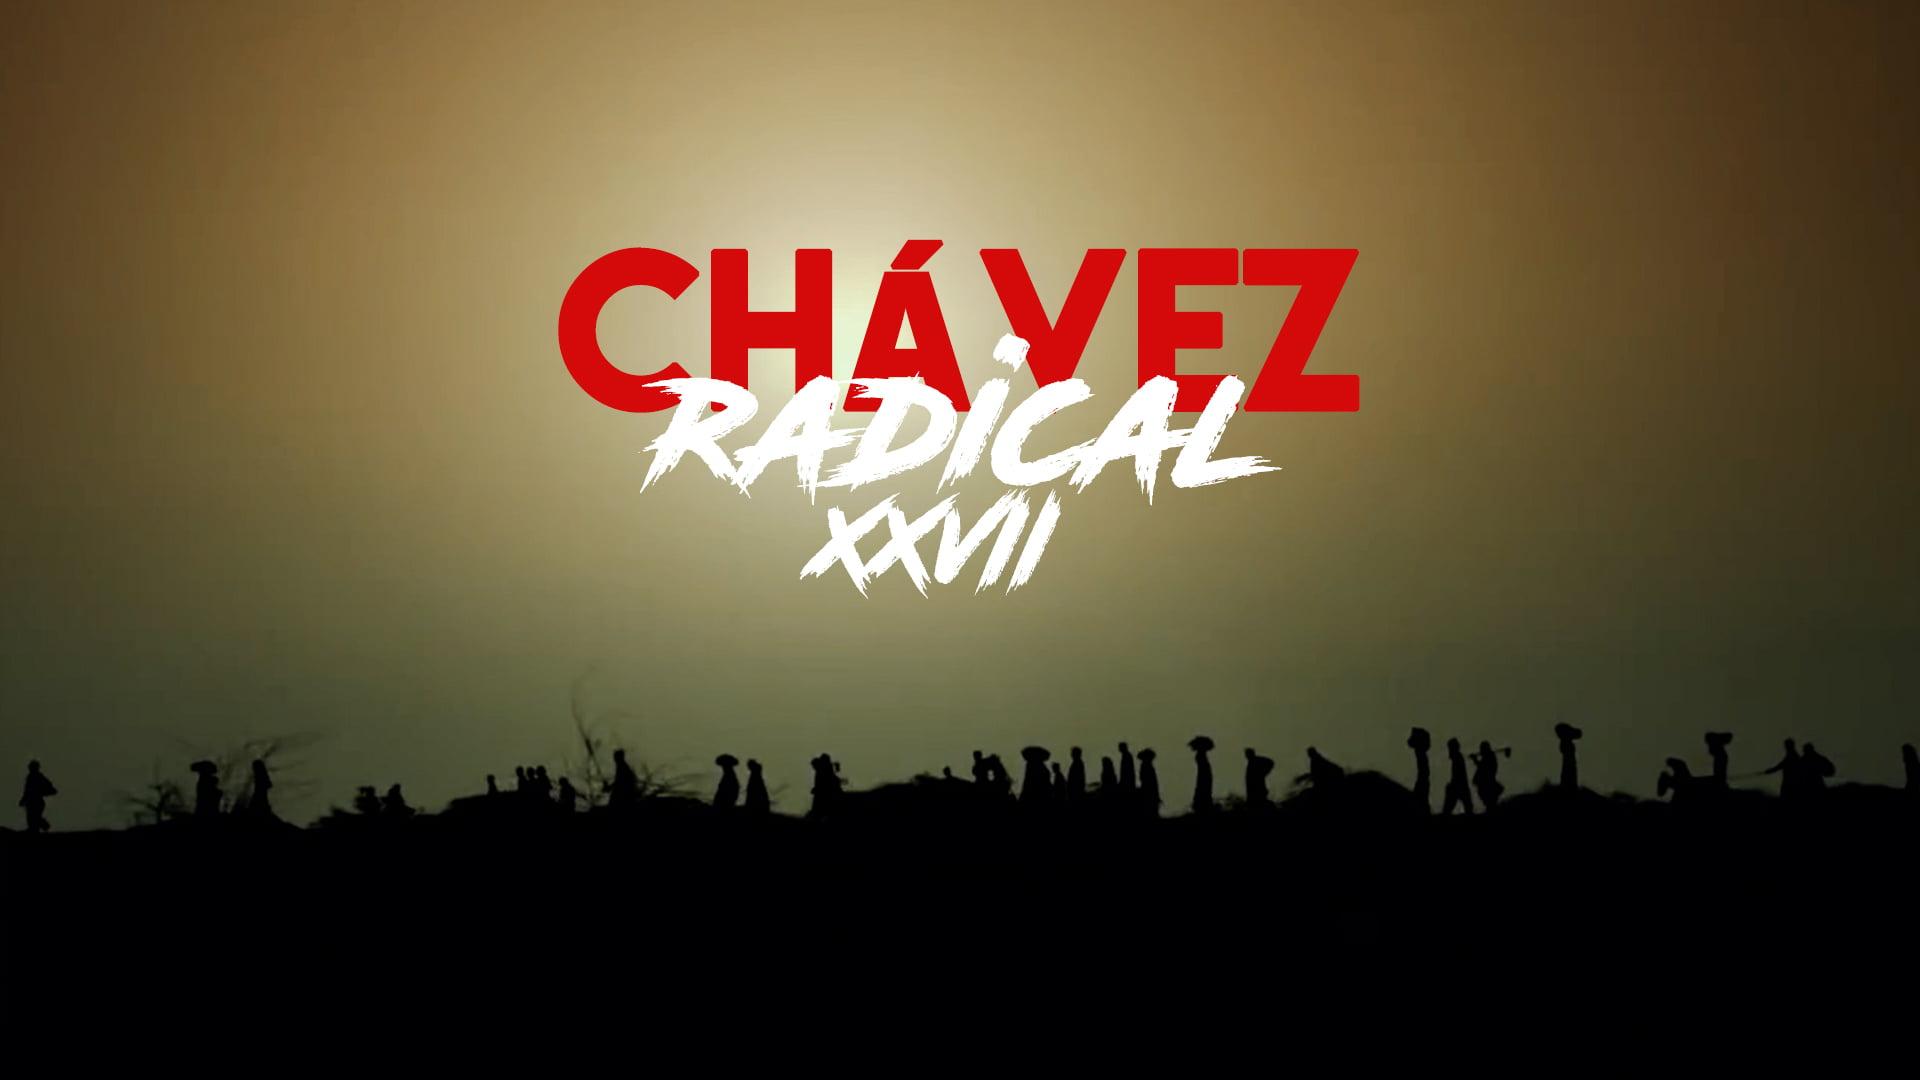 Chavez Radical Lucha de Clases